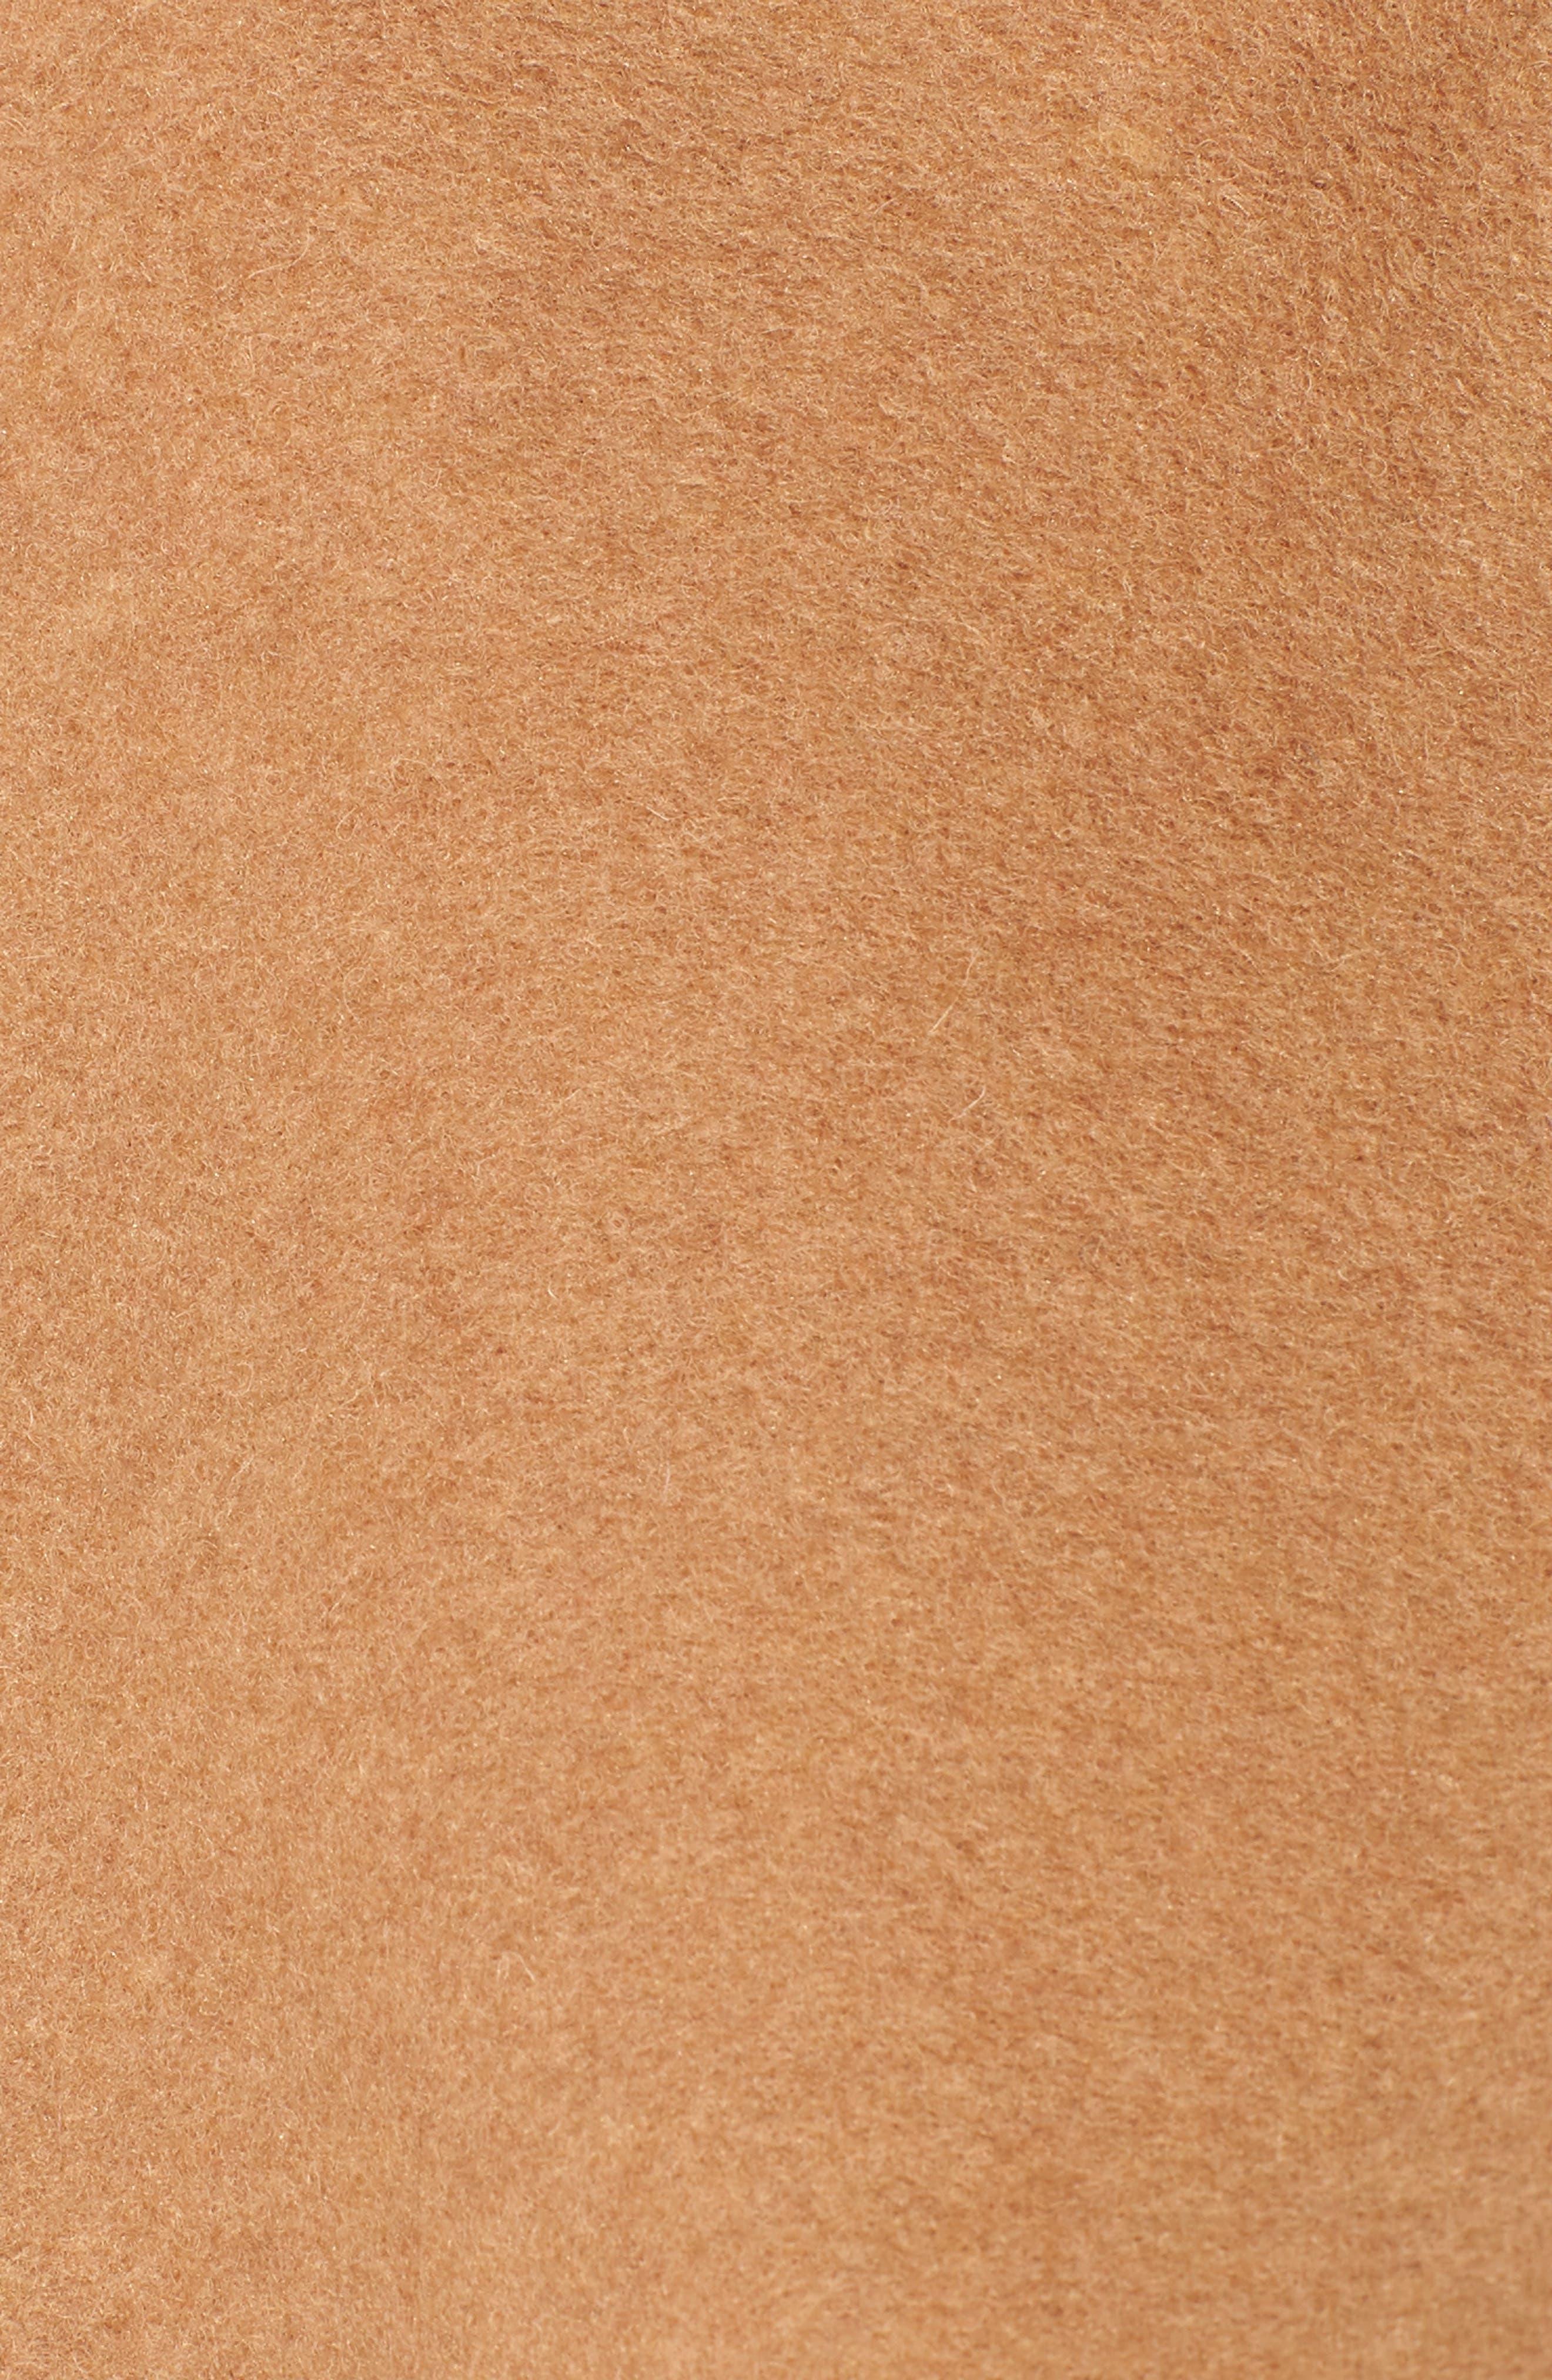 NVLT, Brushed Melton Wool Blend Jacket, Alternate thumbnail 7, color, CAMEL/ CREAM